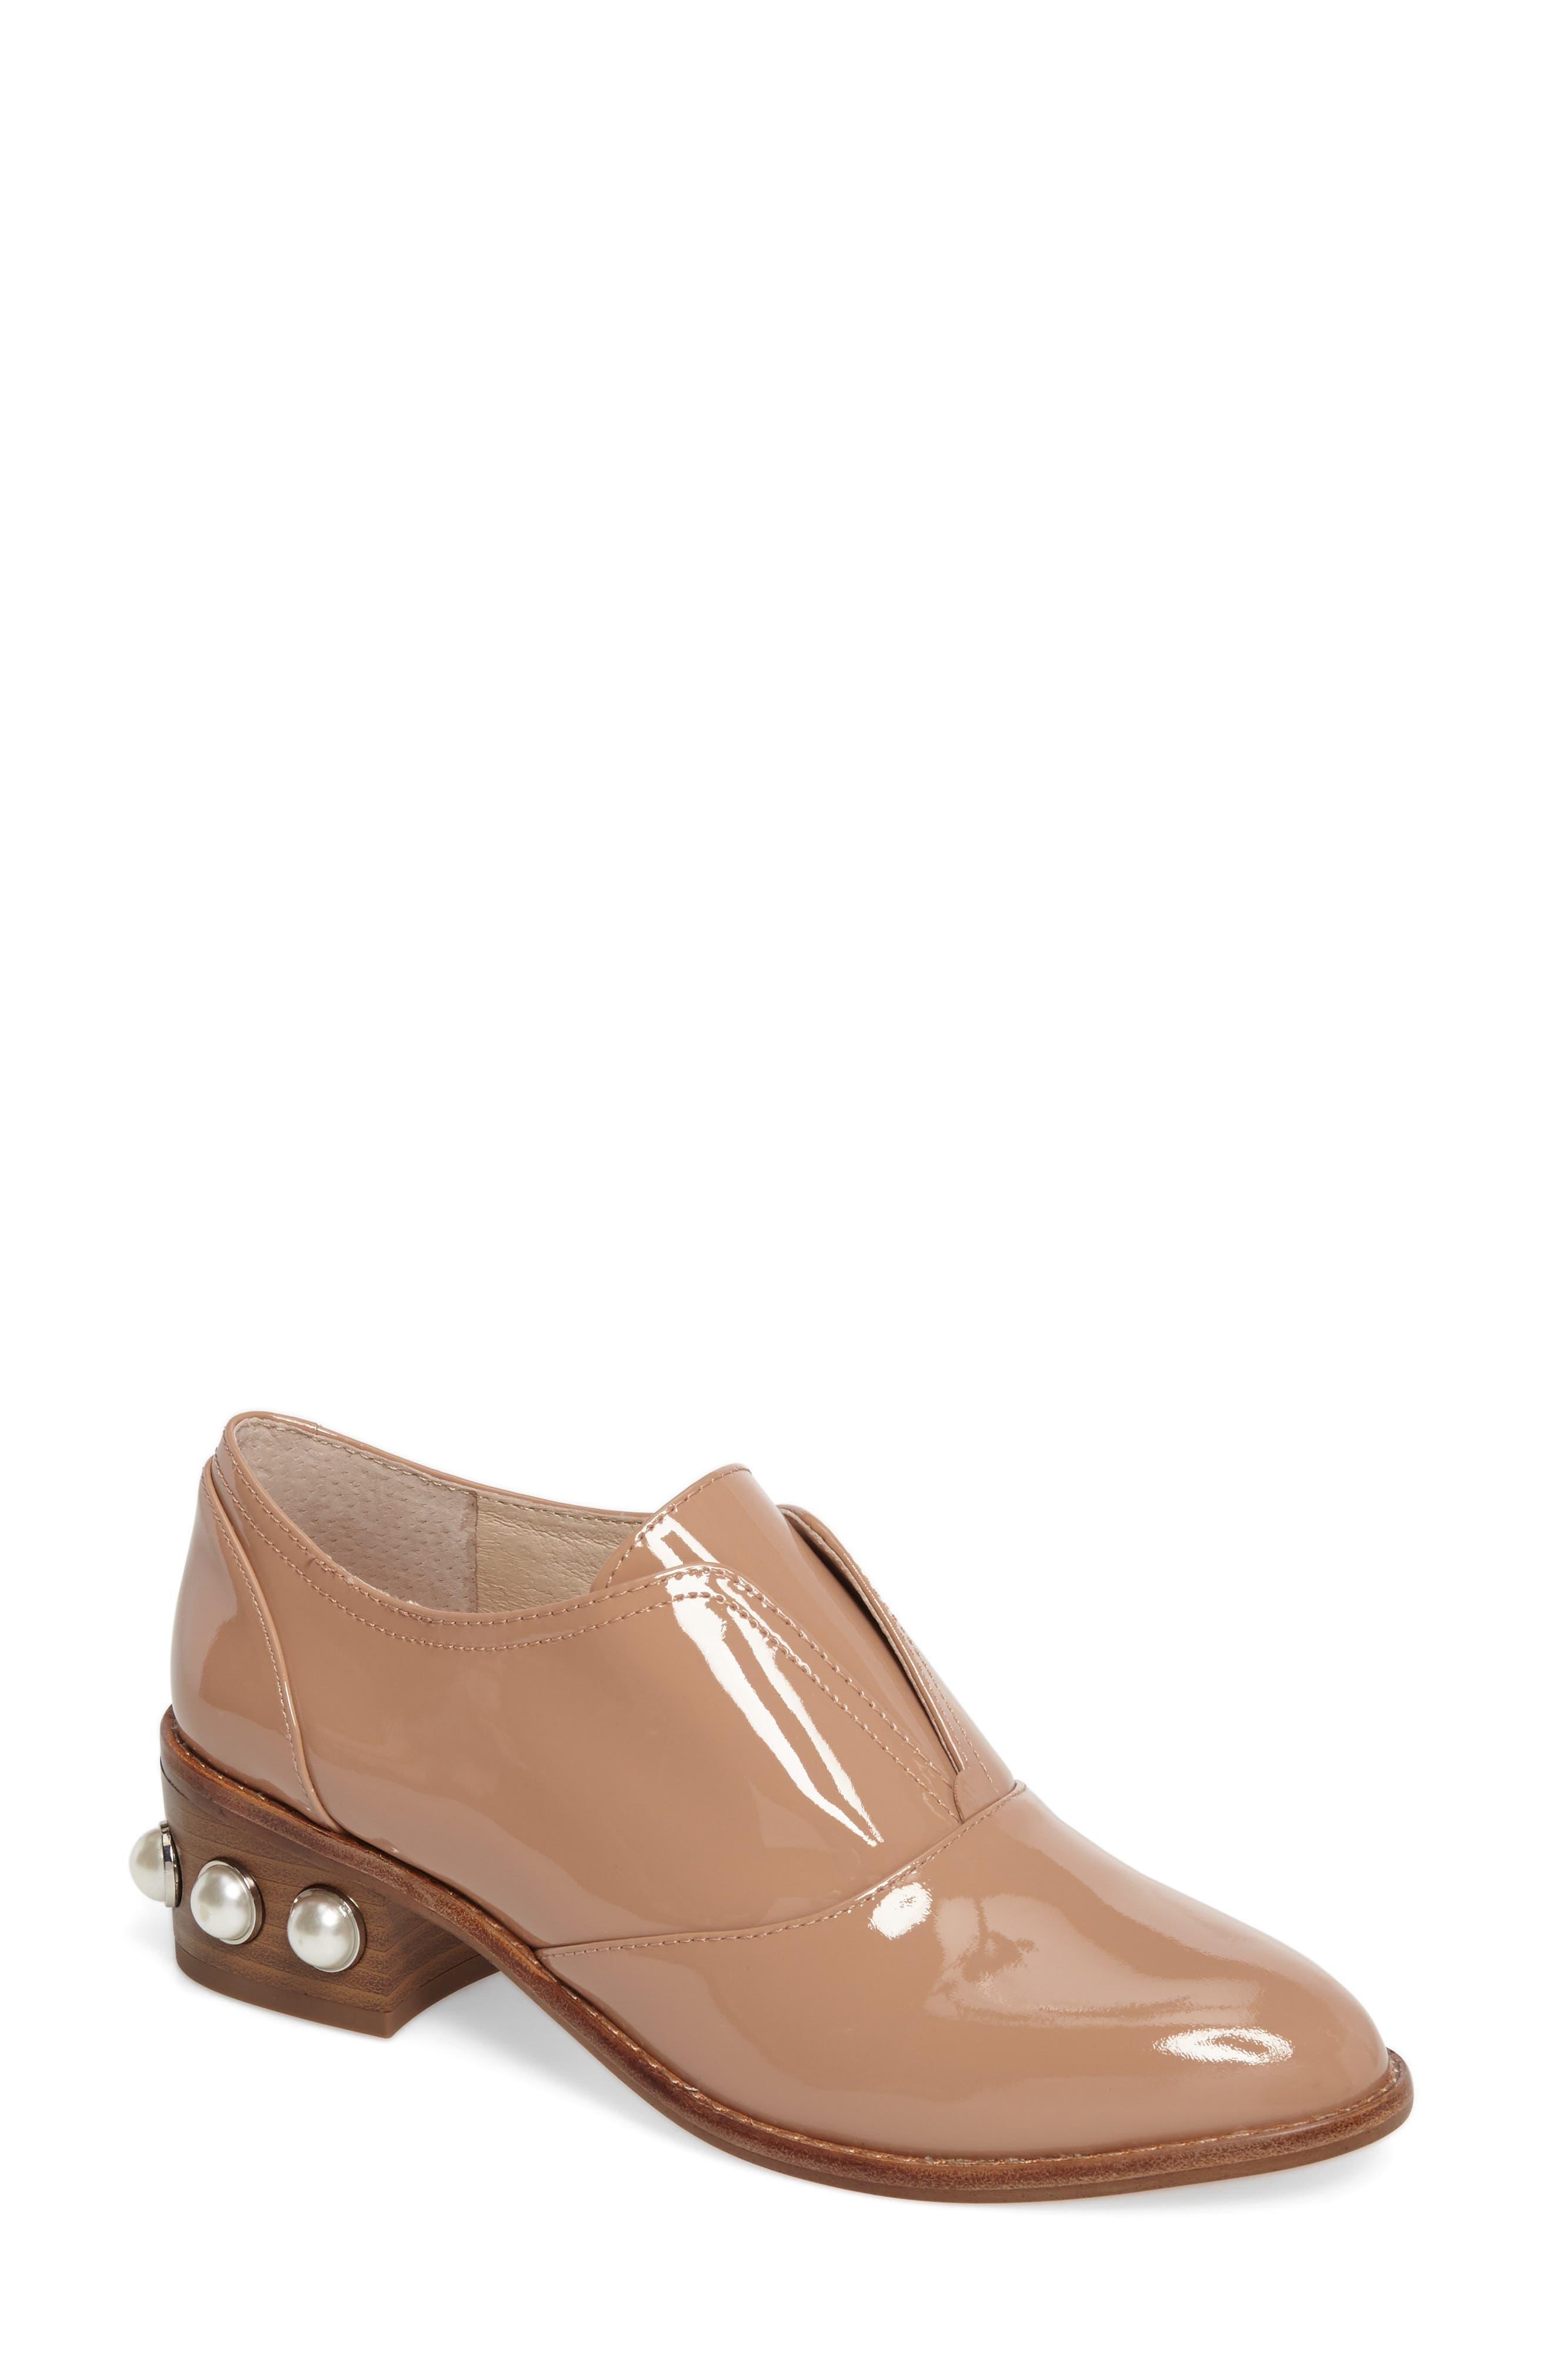 Louise et Cie Franley Embellished Heel Oxford (Women)